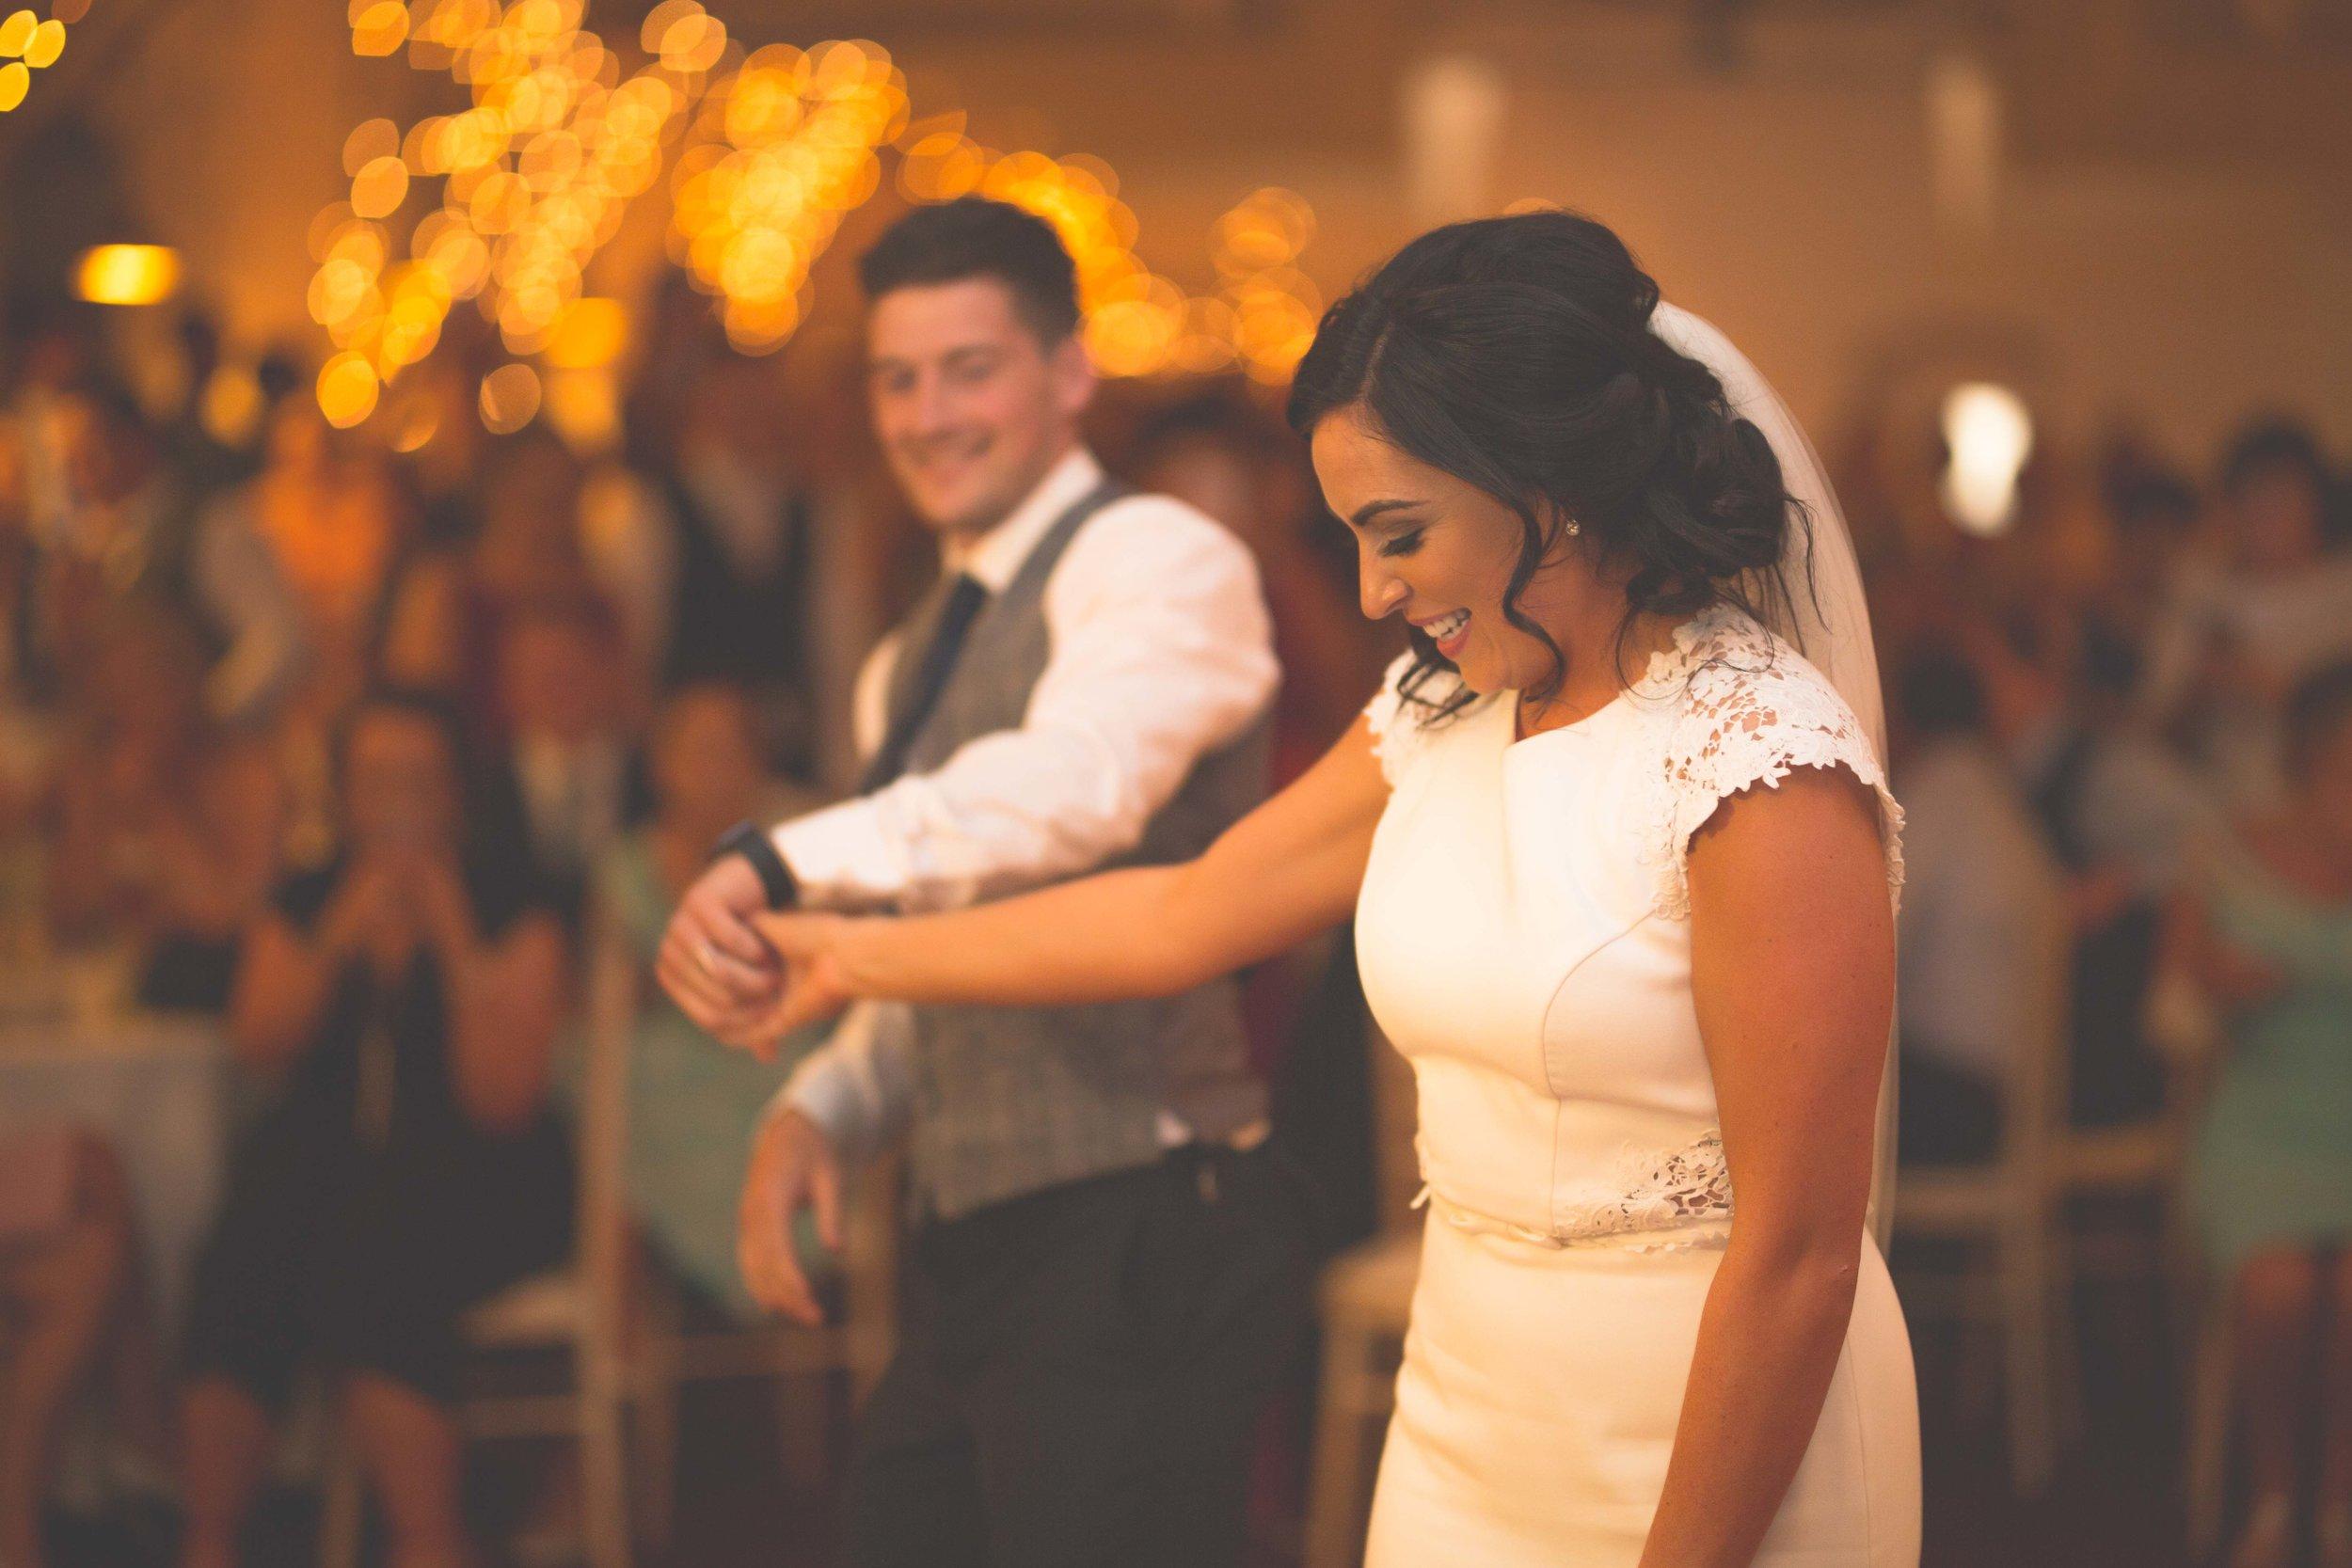 Northern Ireland Wedding Photographer   Brian McEwan Photography   Affordable Wedding Photography Throughout Antrim Down Armagh Tyrone Londonderry Derry Down Fermanagh -20.jpg